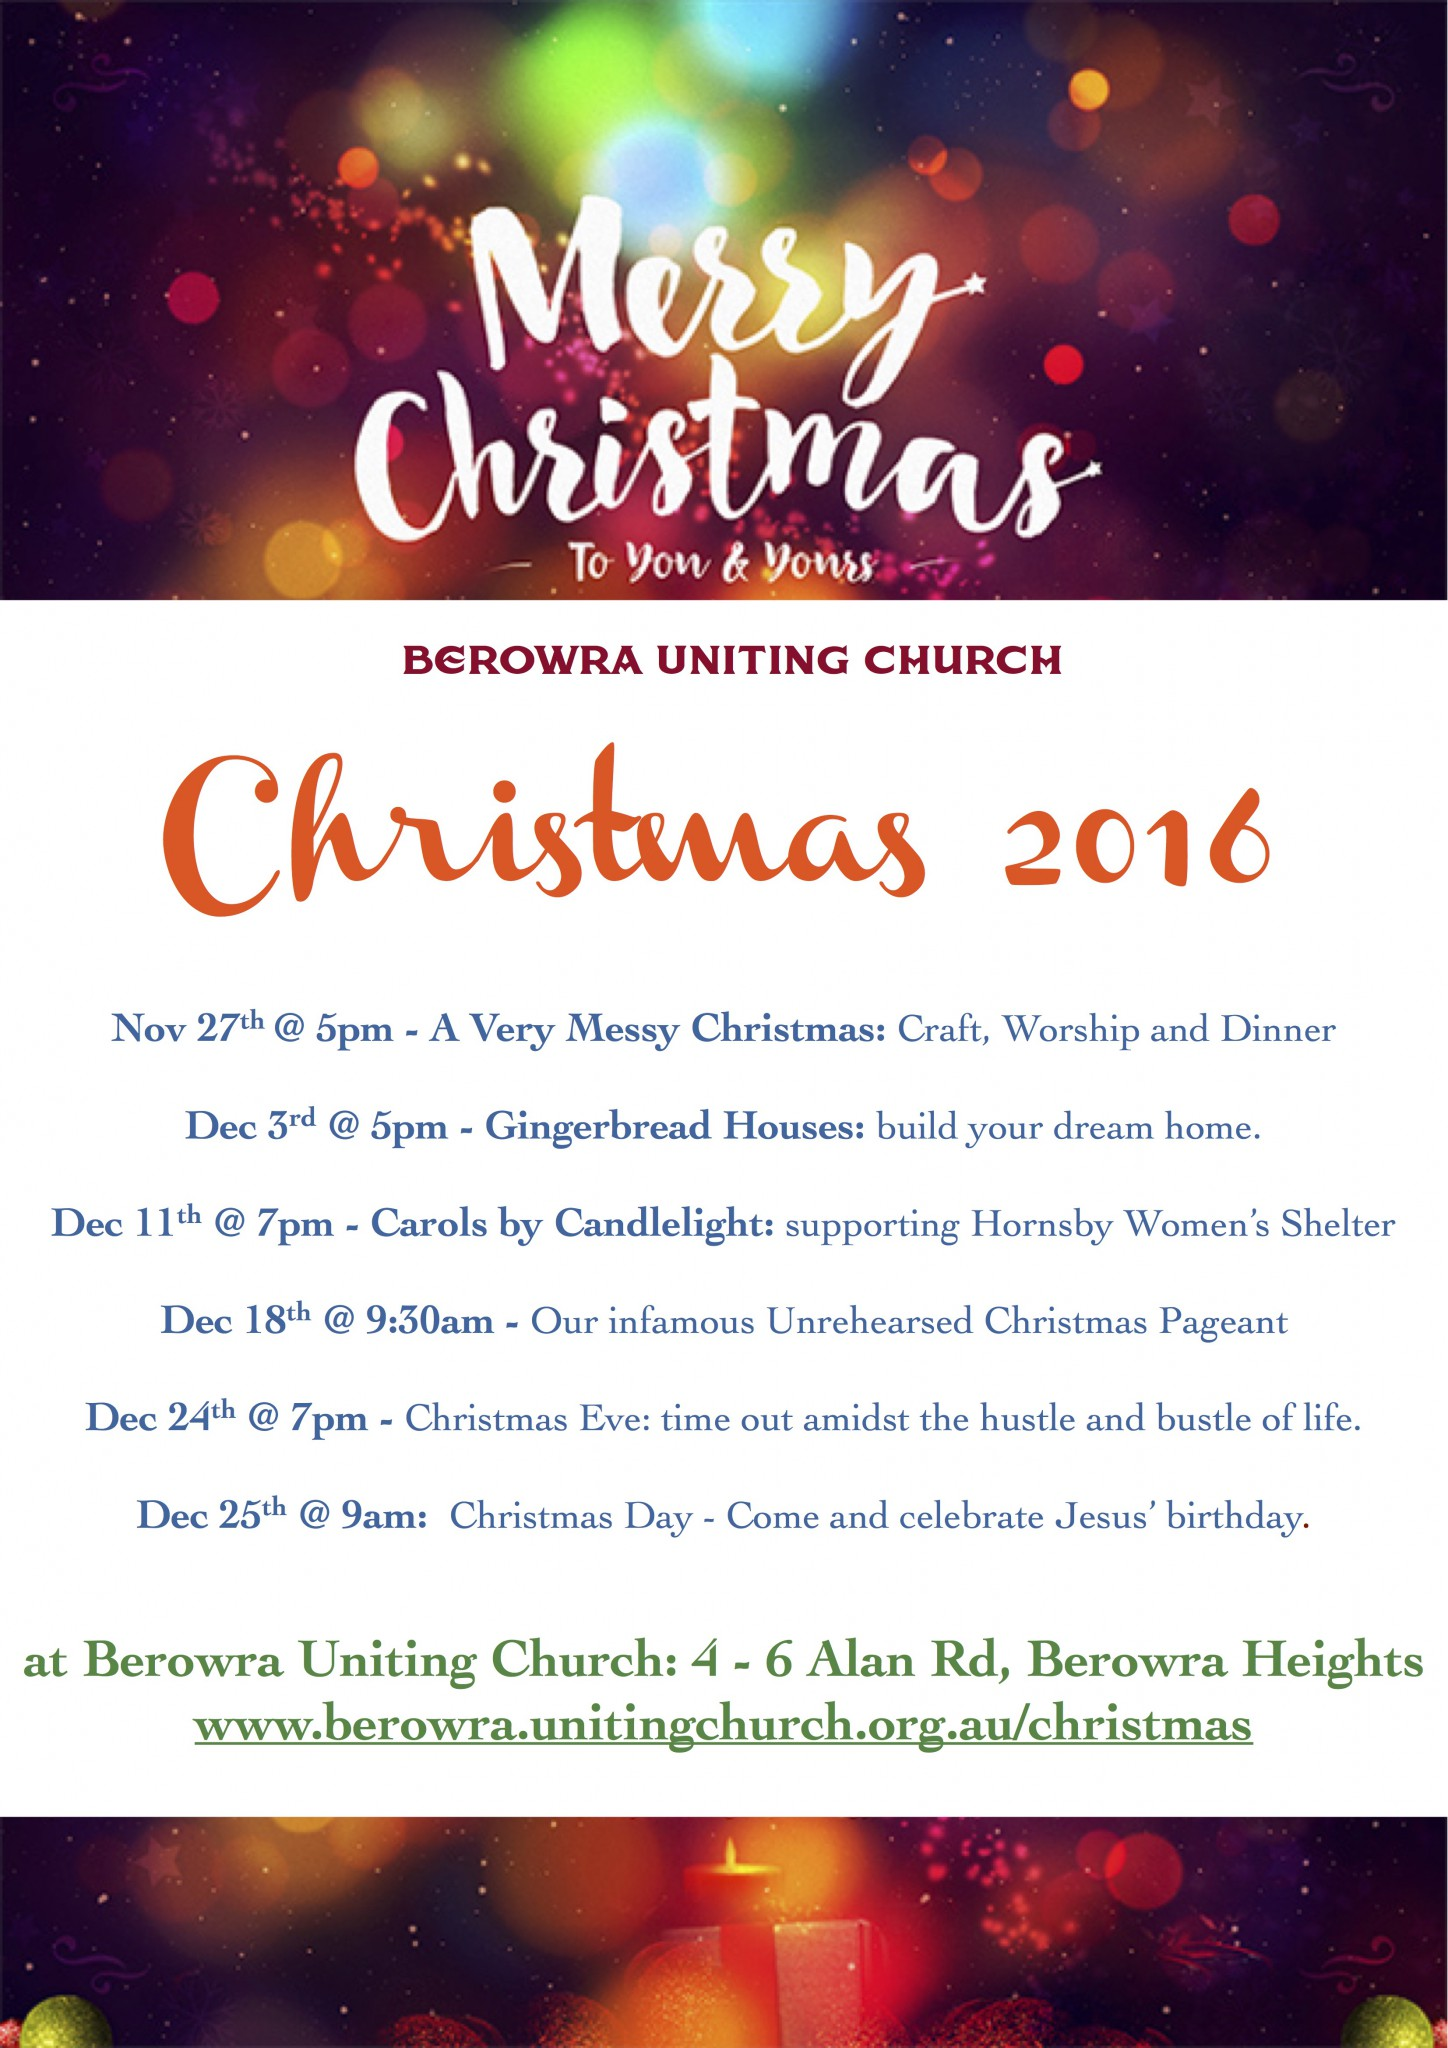 Christmas is Coming! | Berowra Uniting Church